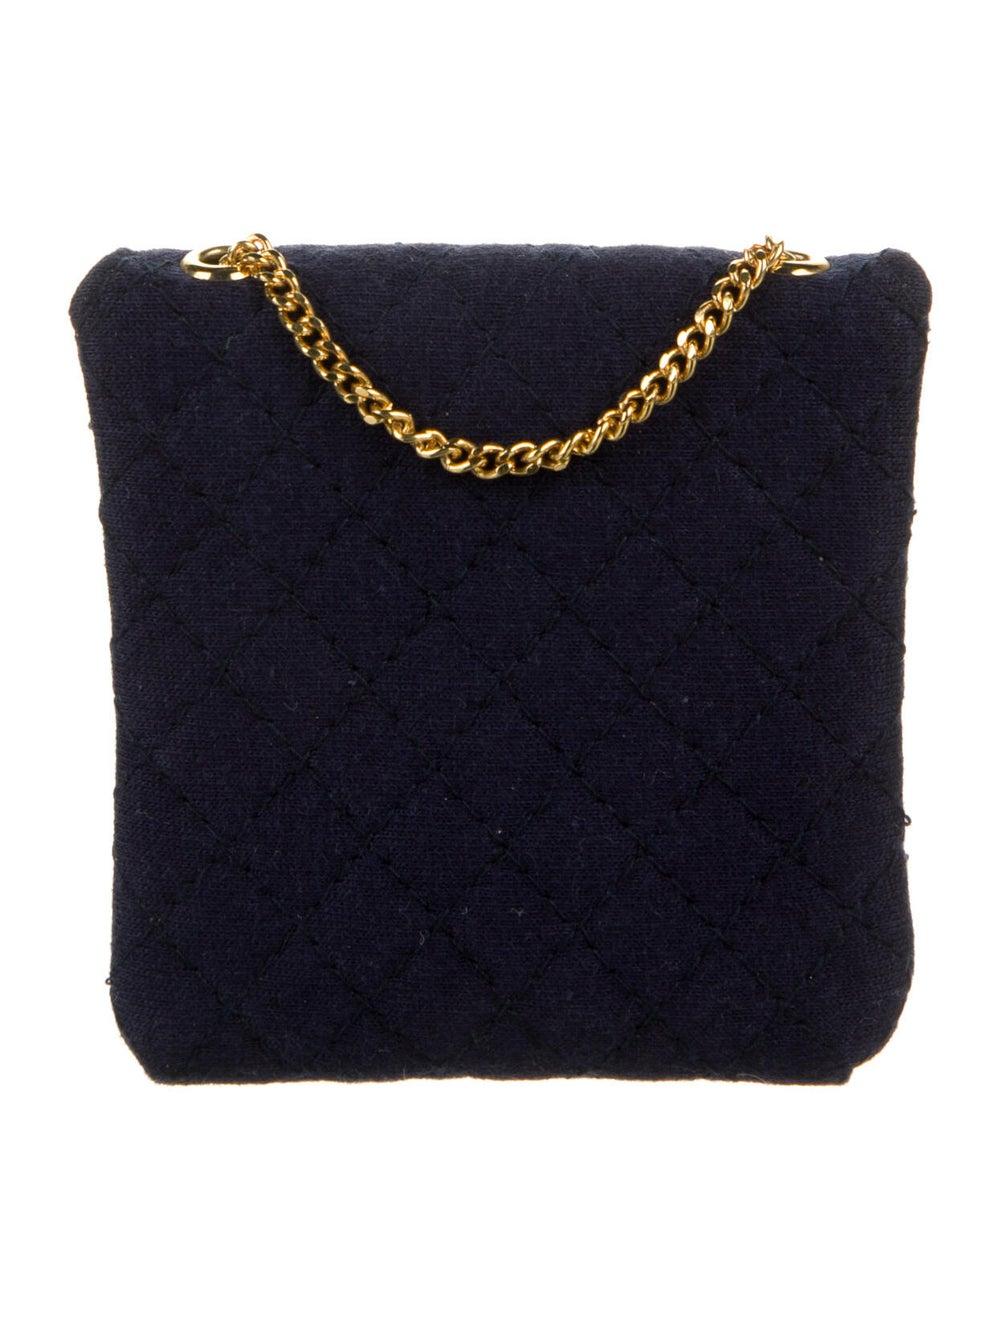 Chanel Vintage Jersey Micro Flap Bag Blue - image 4